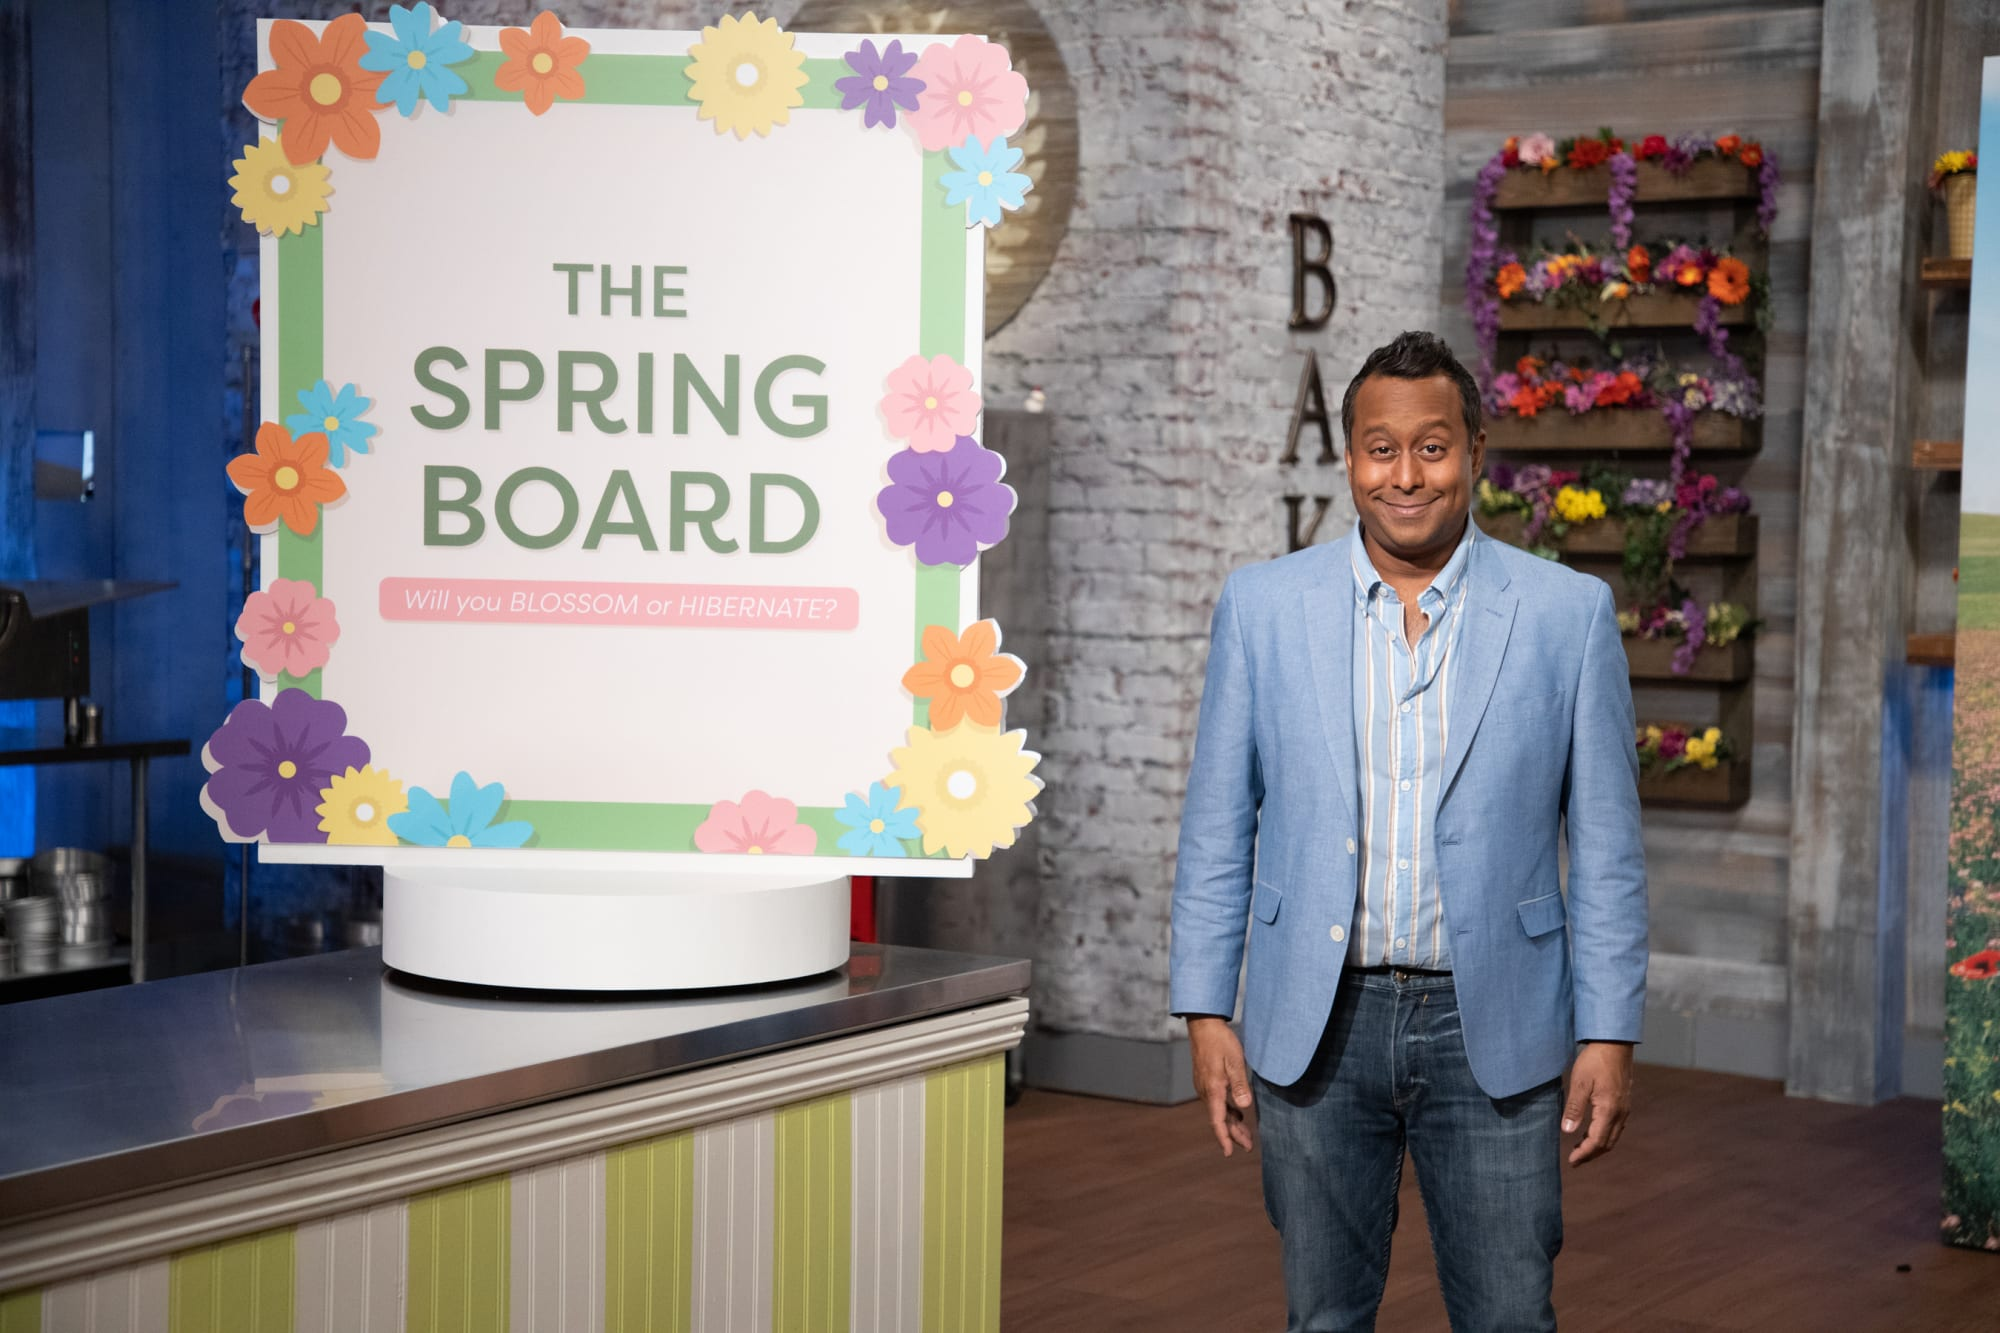 Spring Baking Championship Season 7 episode 7 preview: Cookie time